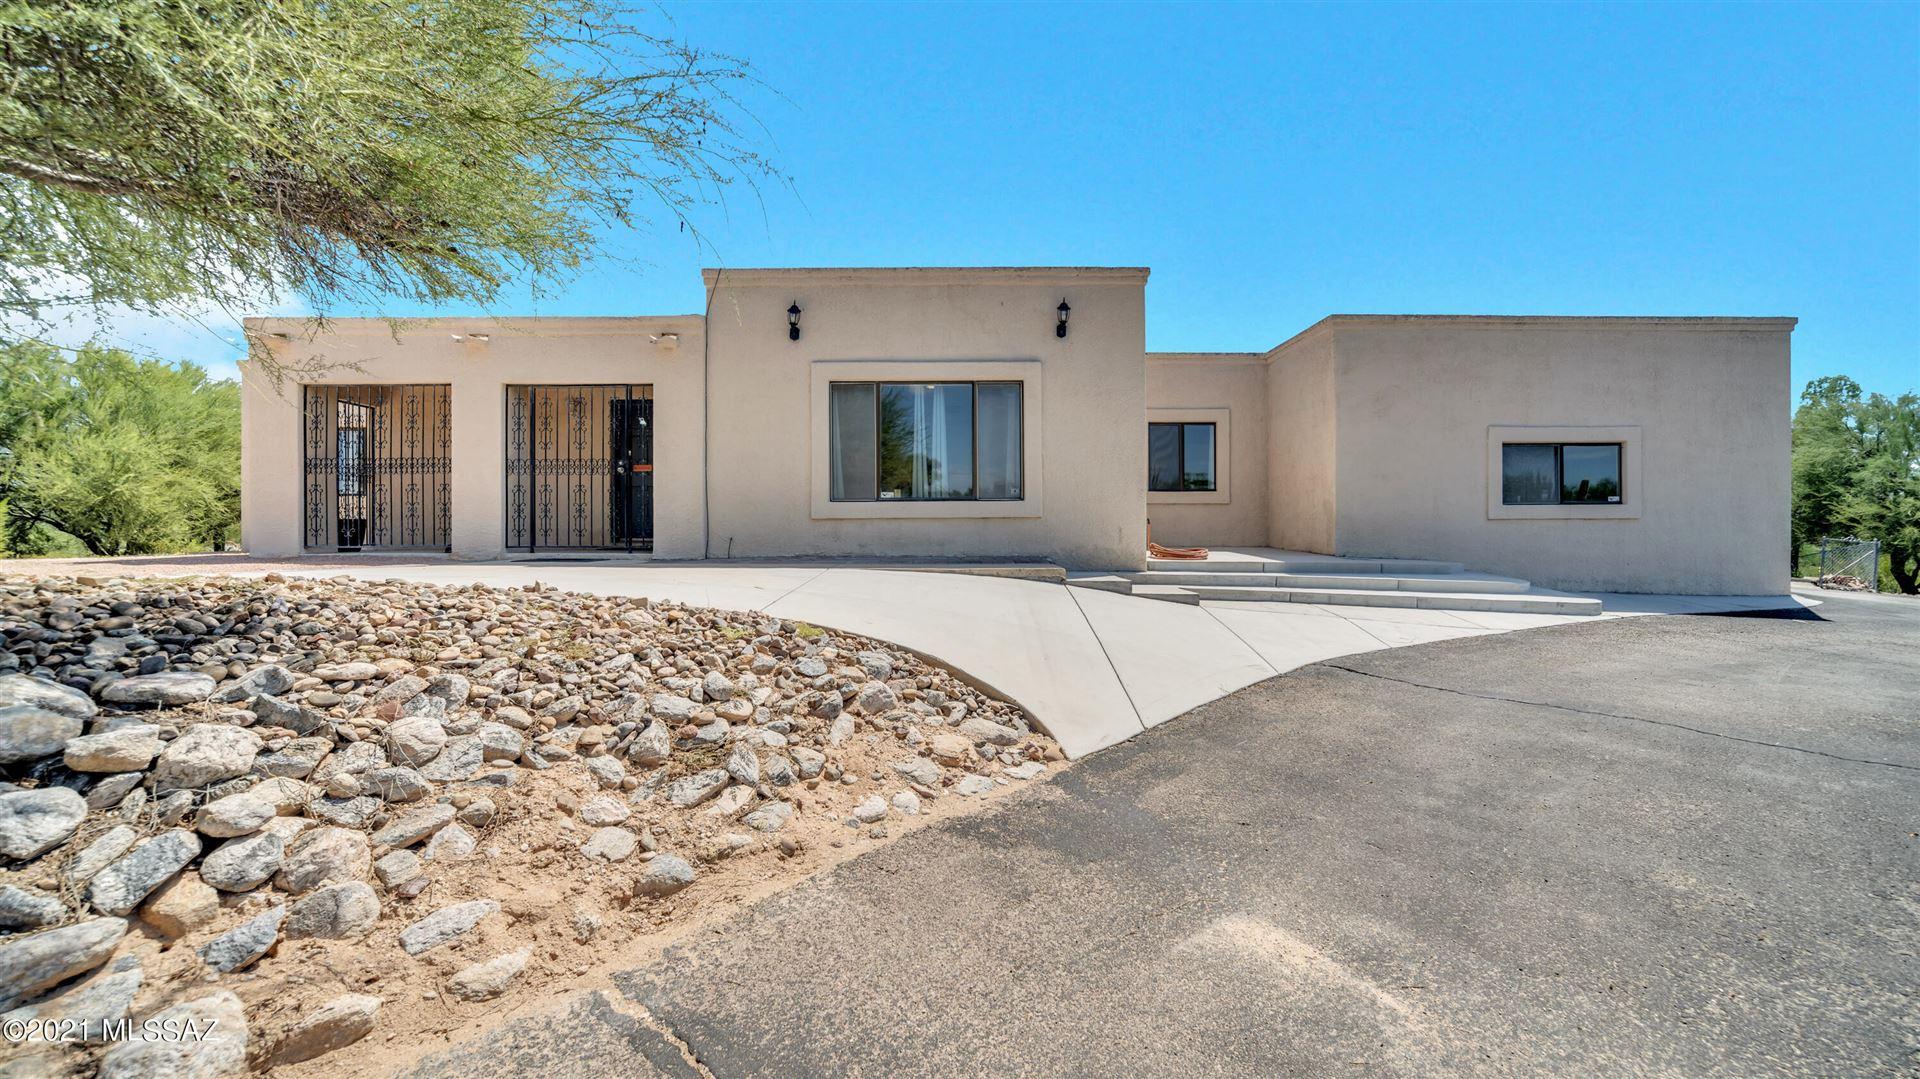 1401 W Las Lomitas Road, Tucson, AZ 85704 - MLS#: 22115514